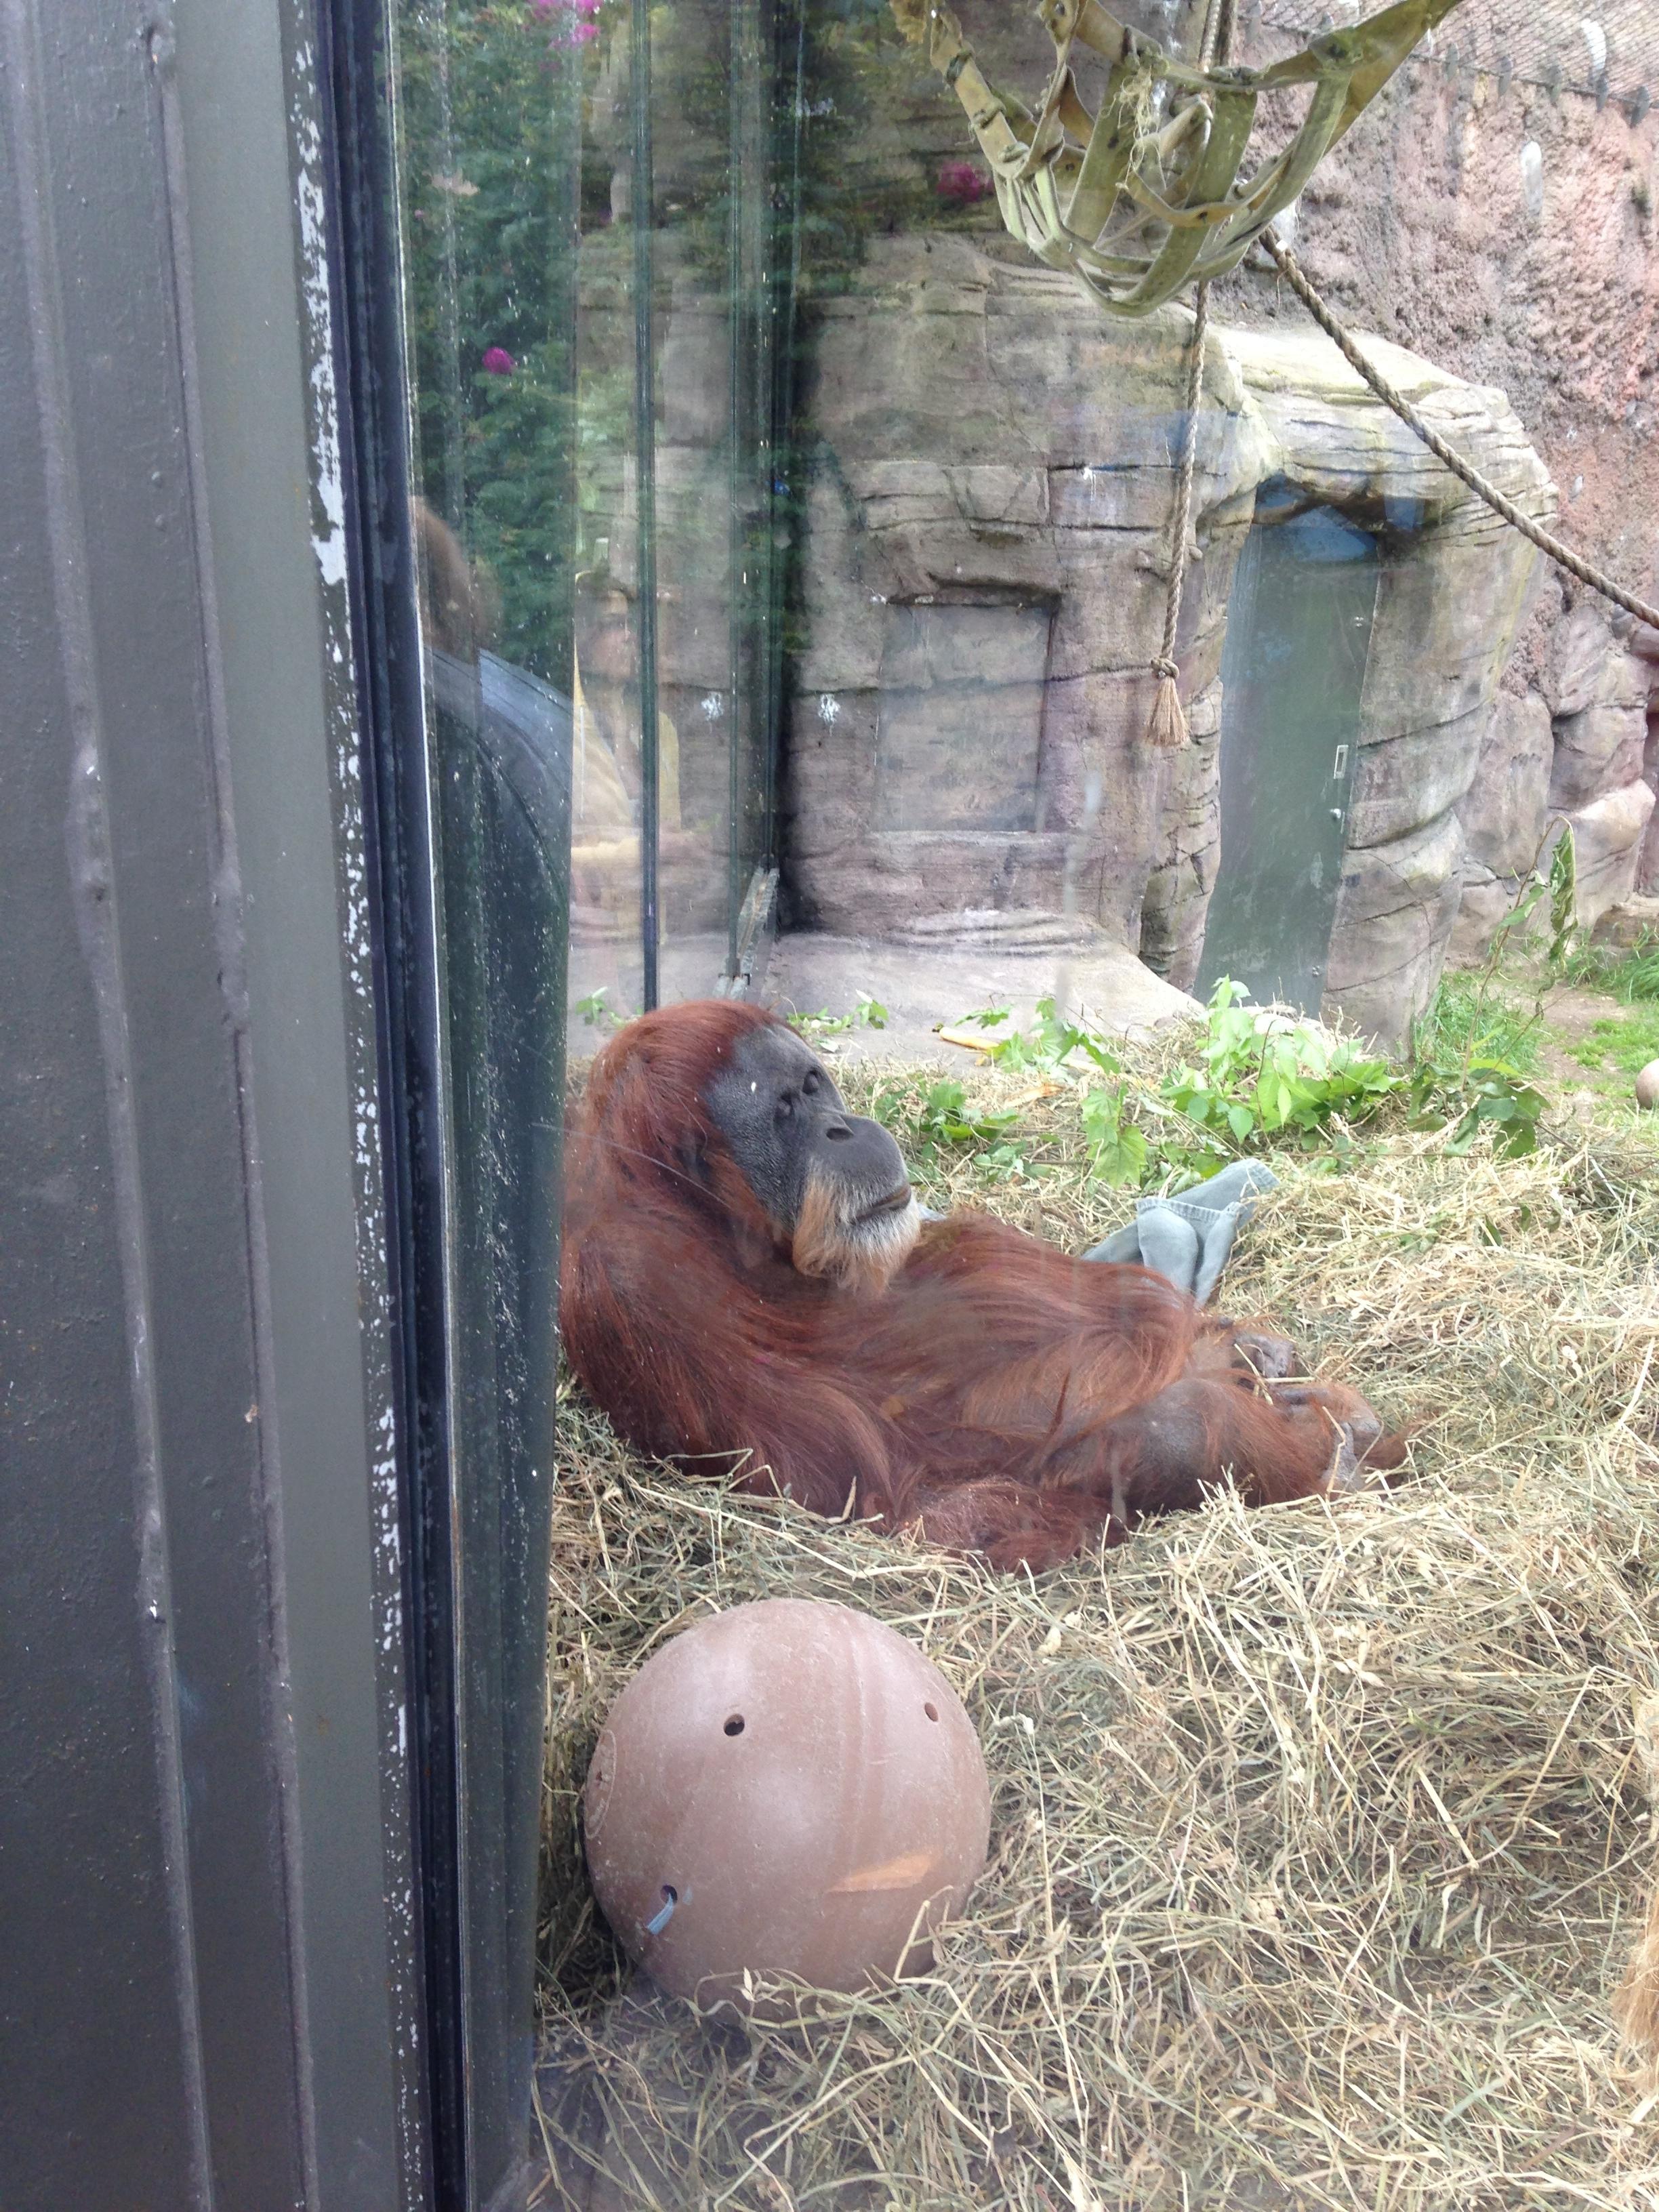 Oregon Zoo: Day Trip To The Oregon Zoo